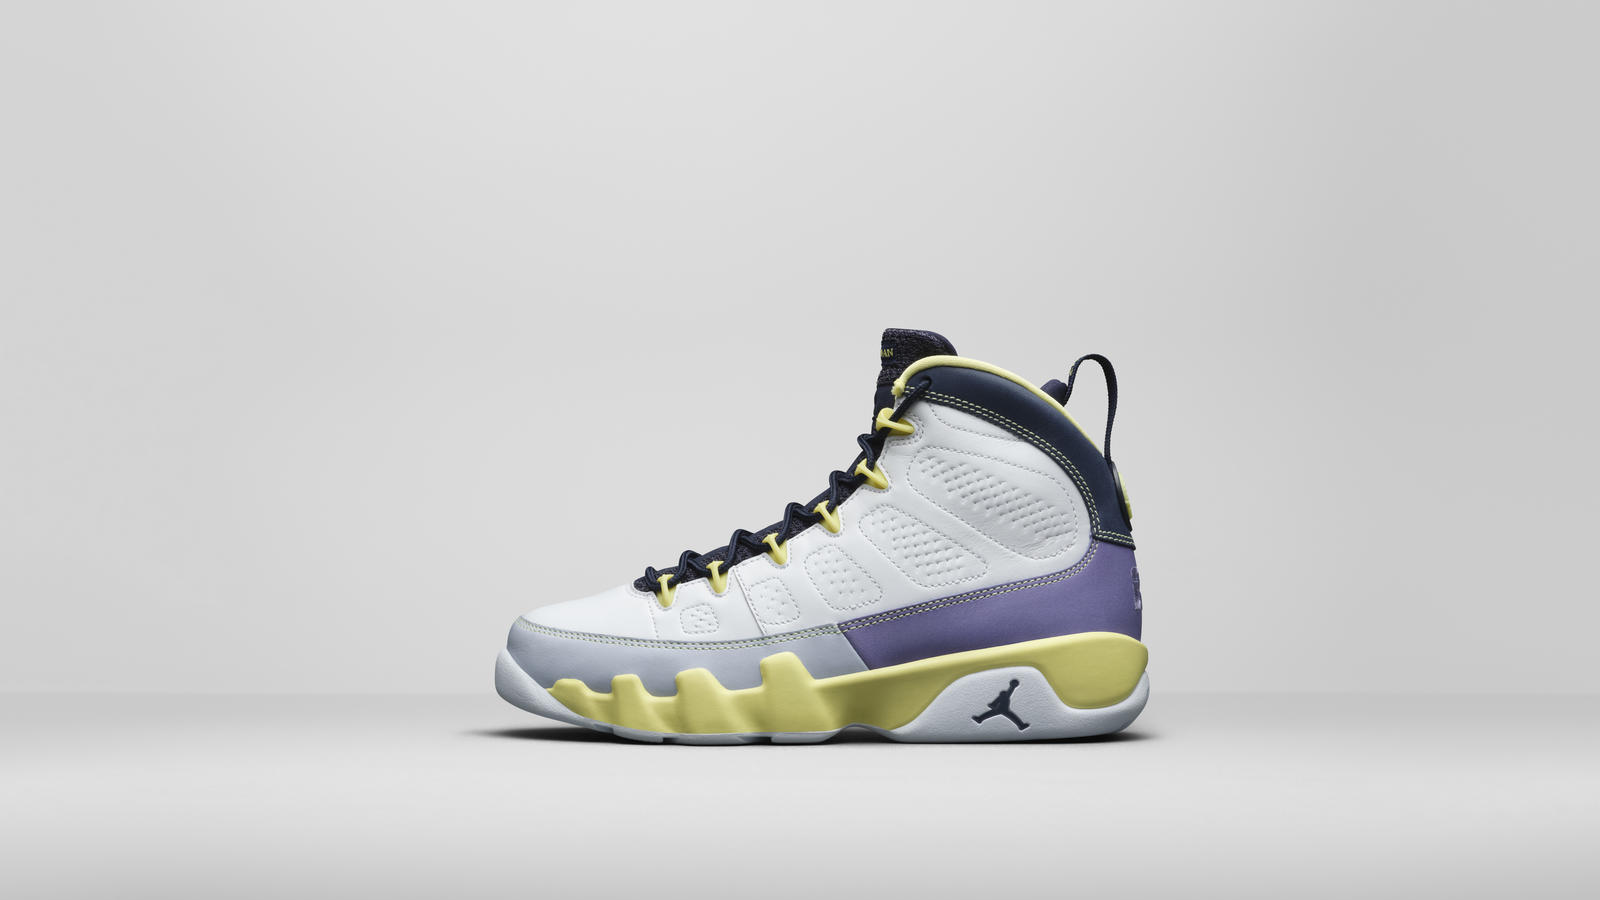 Jordan Brand Spring 2021 Retro Releases 10